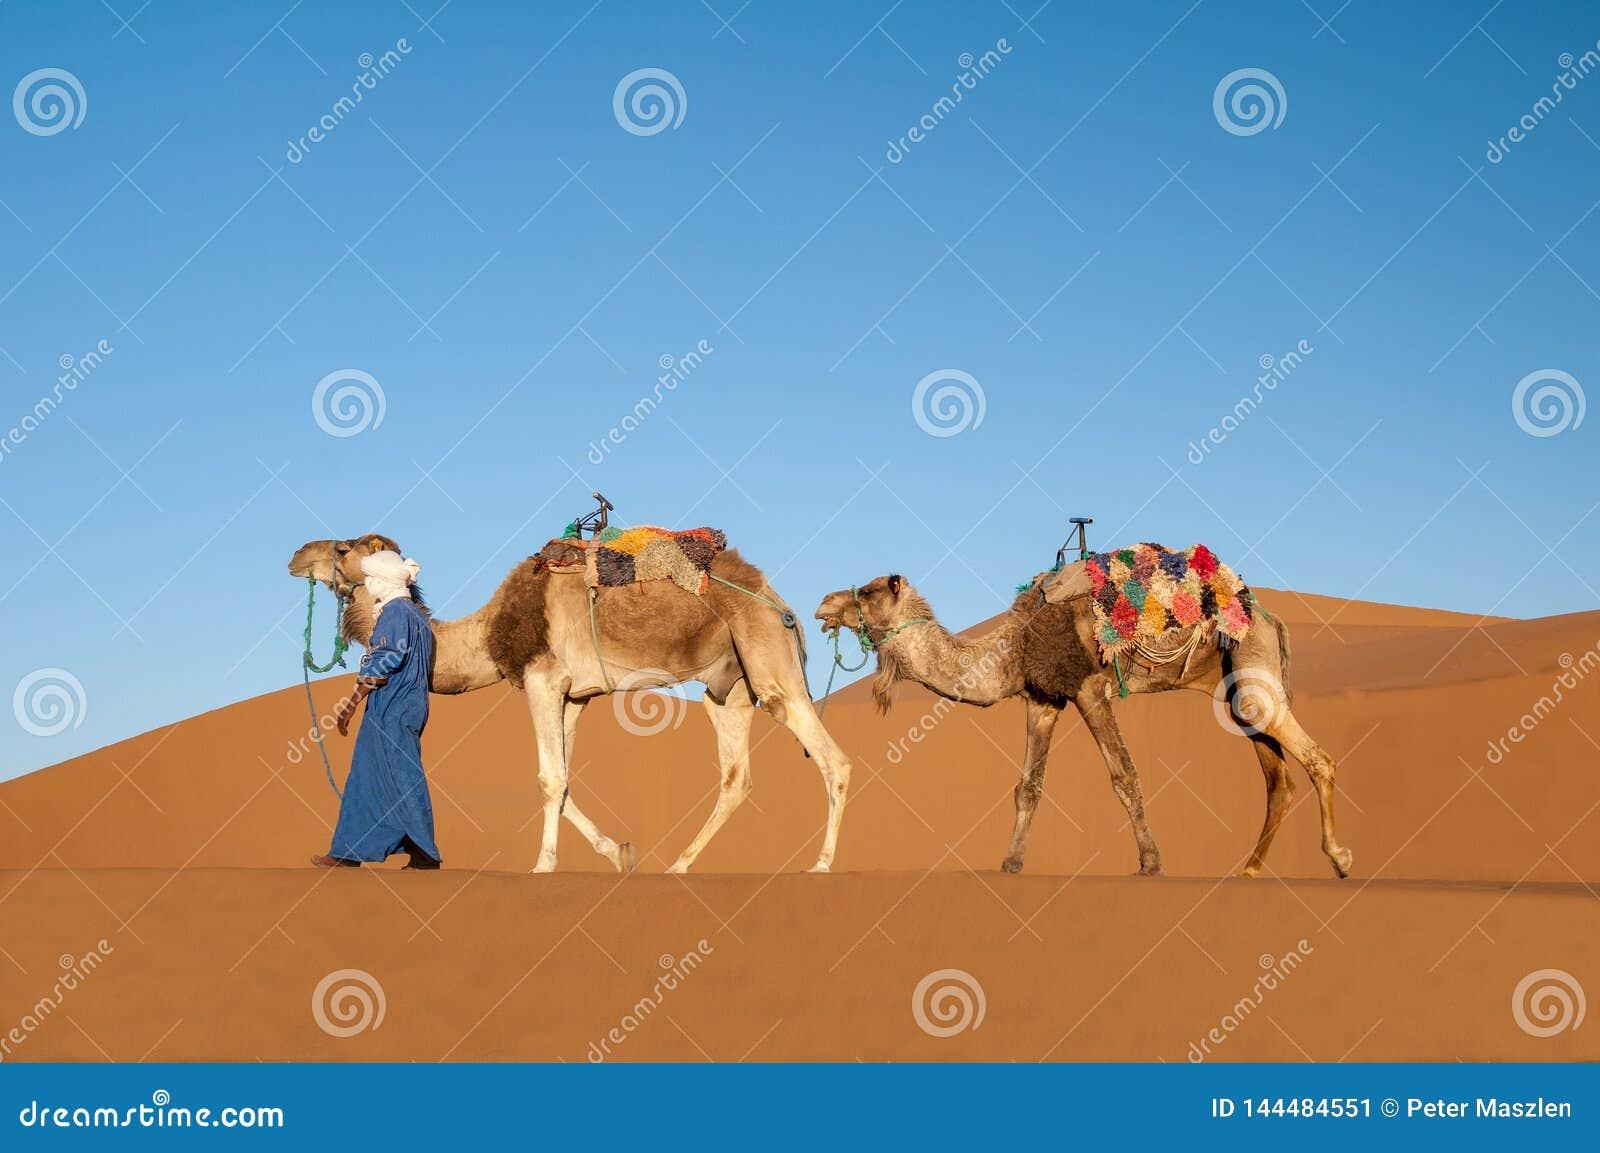 Nomad with dromedary caravan in the Sahara desert